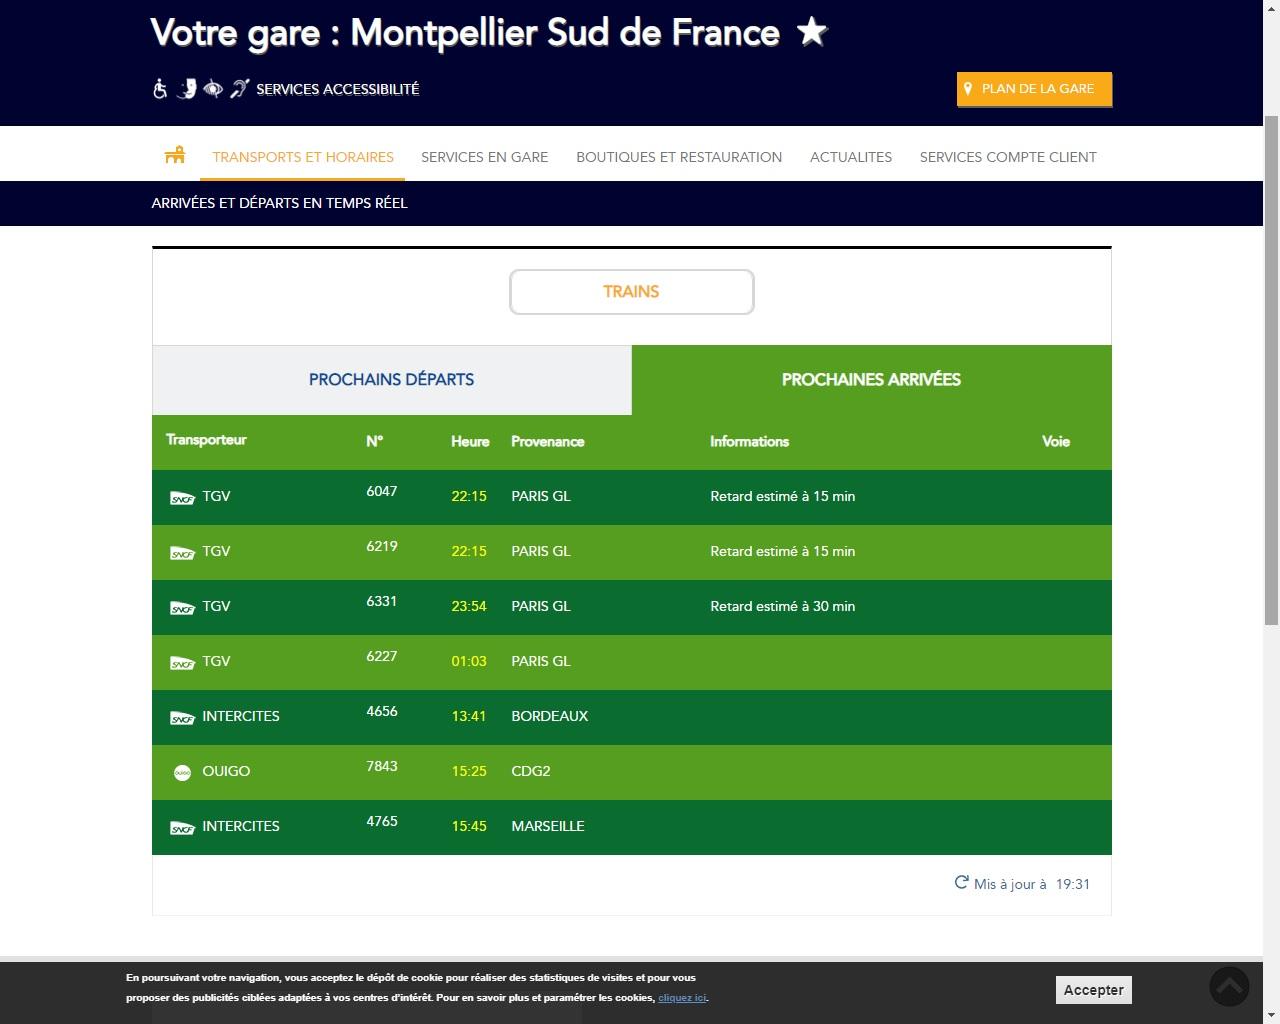 9 novembre 2018  u2013 gare de montpellier sud de france  selon